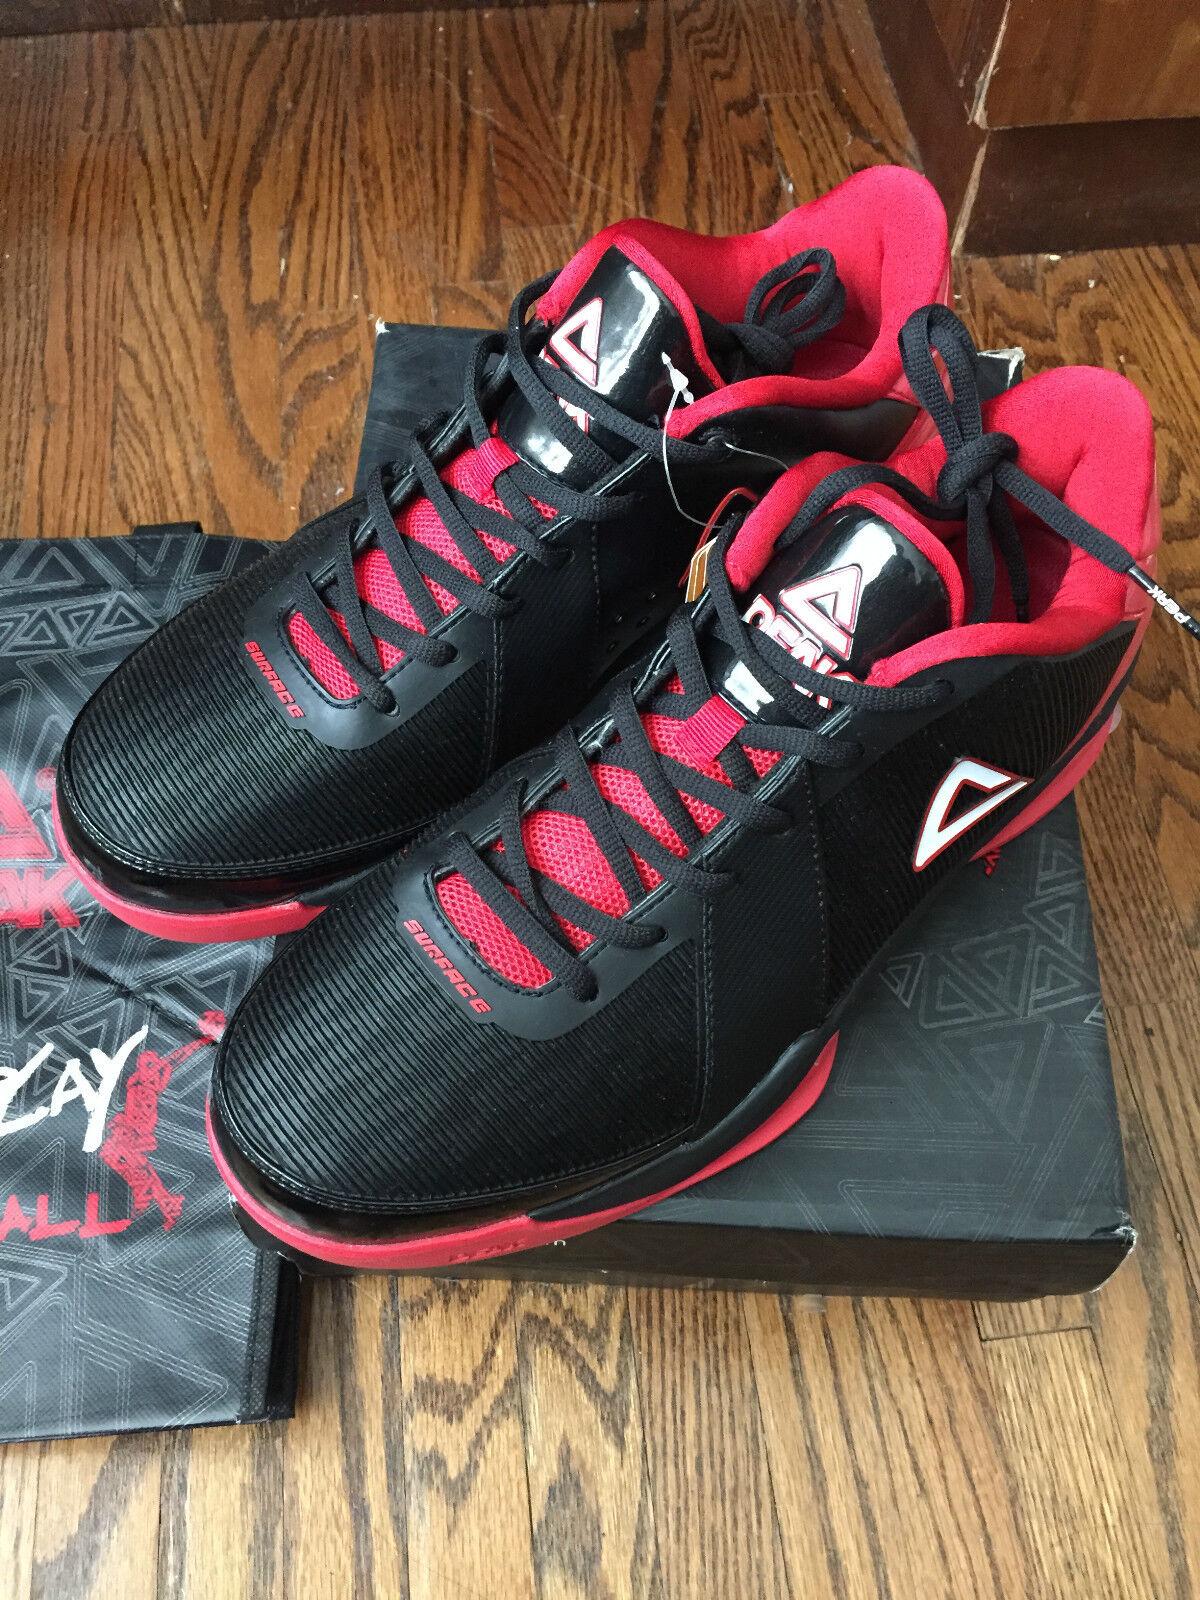 PEAK Team NBA Tgoldnto Raptors Kyle Lowry Signature Basketball shoes SIZE US10